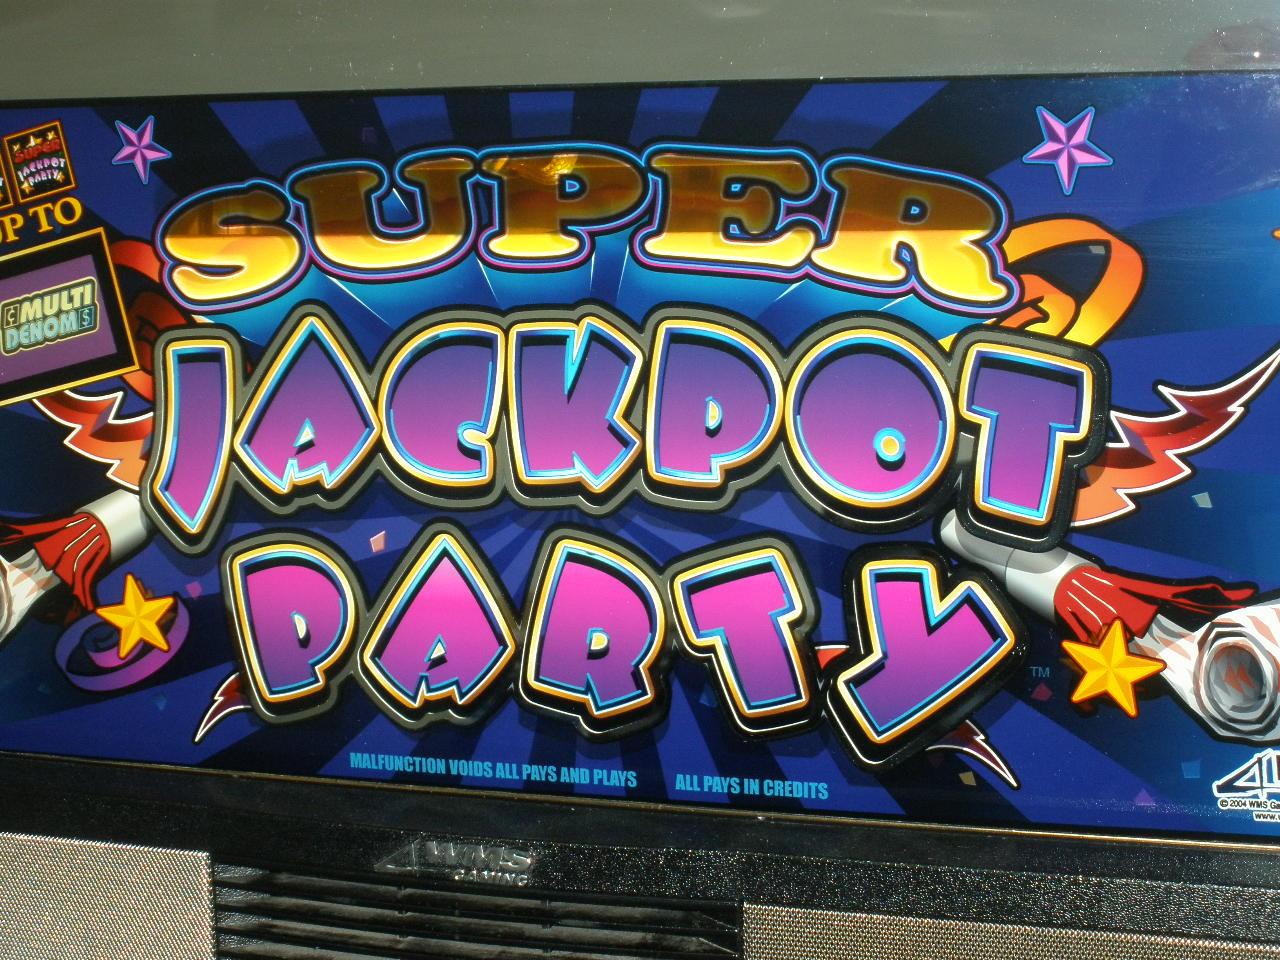 Party Pooper Slot Machine